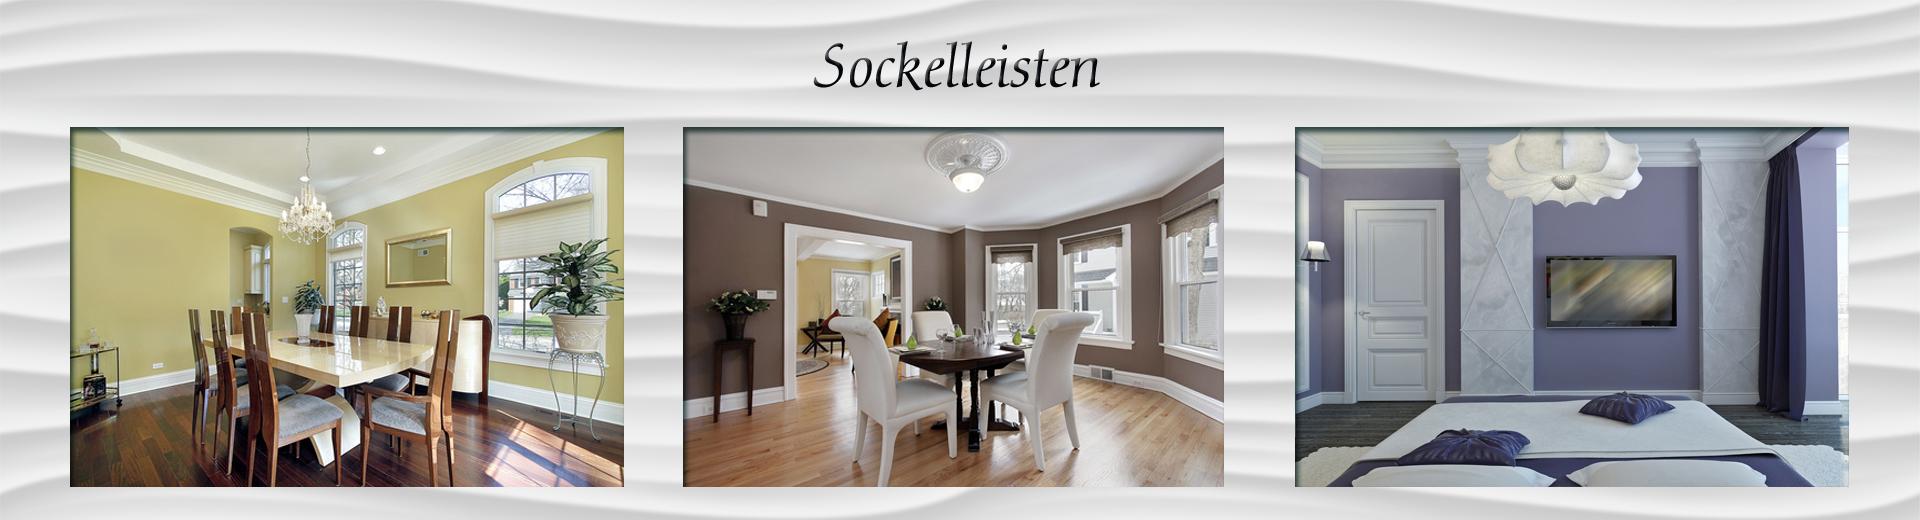 Sockelleisten aus gips echtstuck sockelleiste g nstig online kaufen stuck shop - Stuck dekor hardt ...